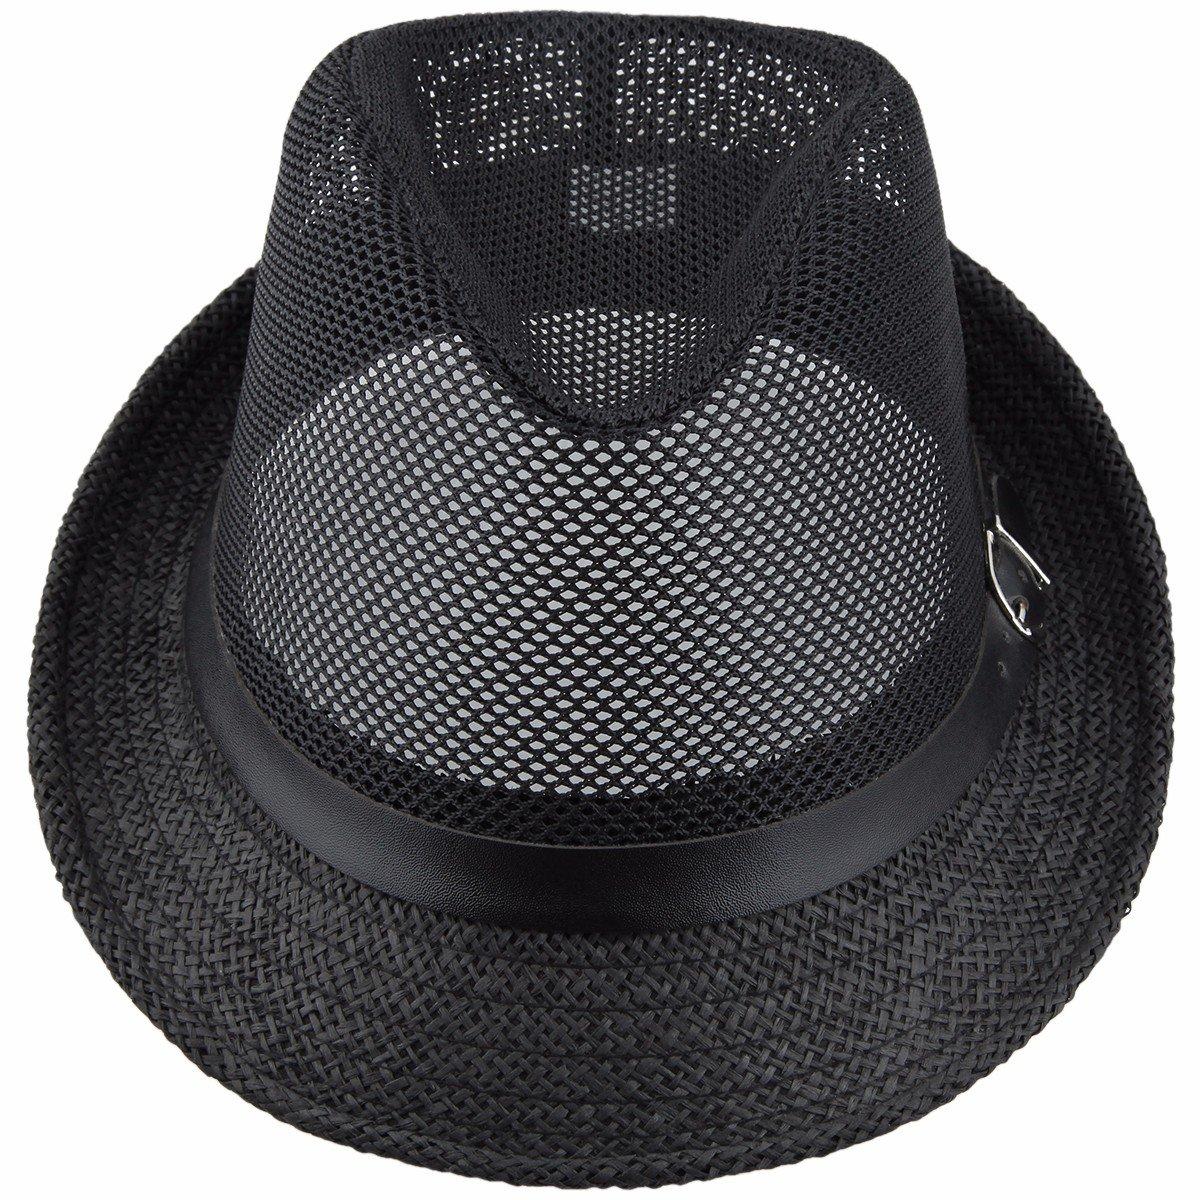 a070bcc81d8857 Samtree Fedora Hats for Women Men,Braid Straw Short Brim Jazz Panama  Cap(03-Black): Amazon.in: Clothing & Accessories